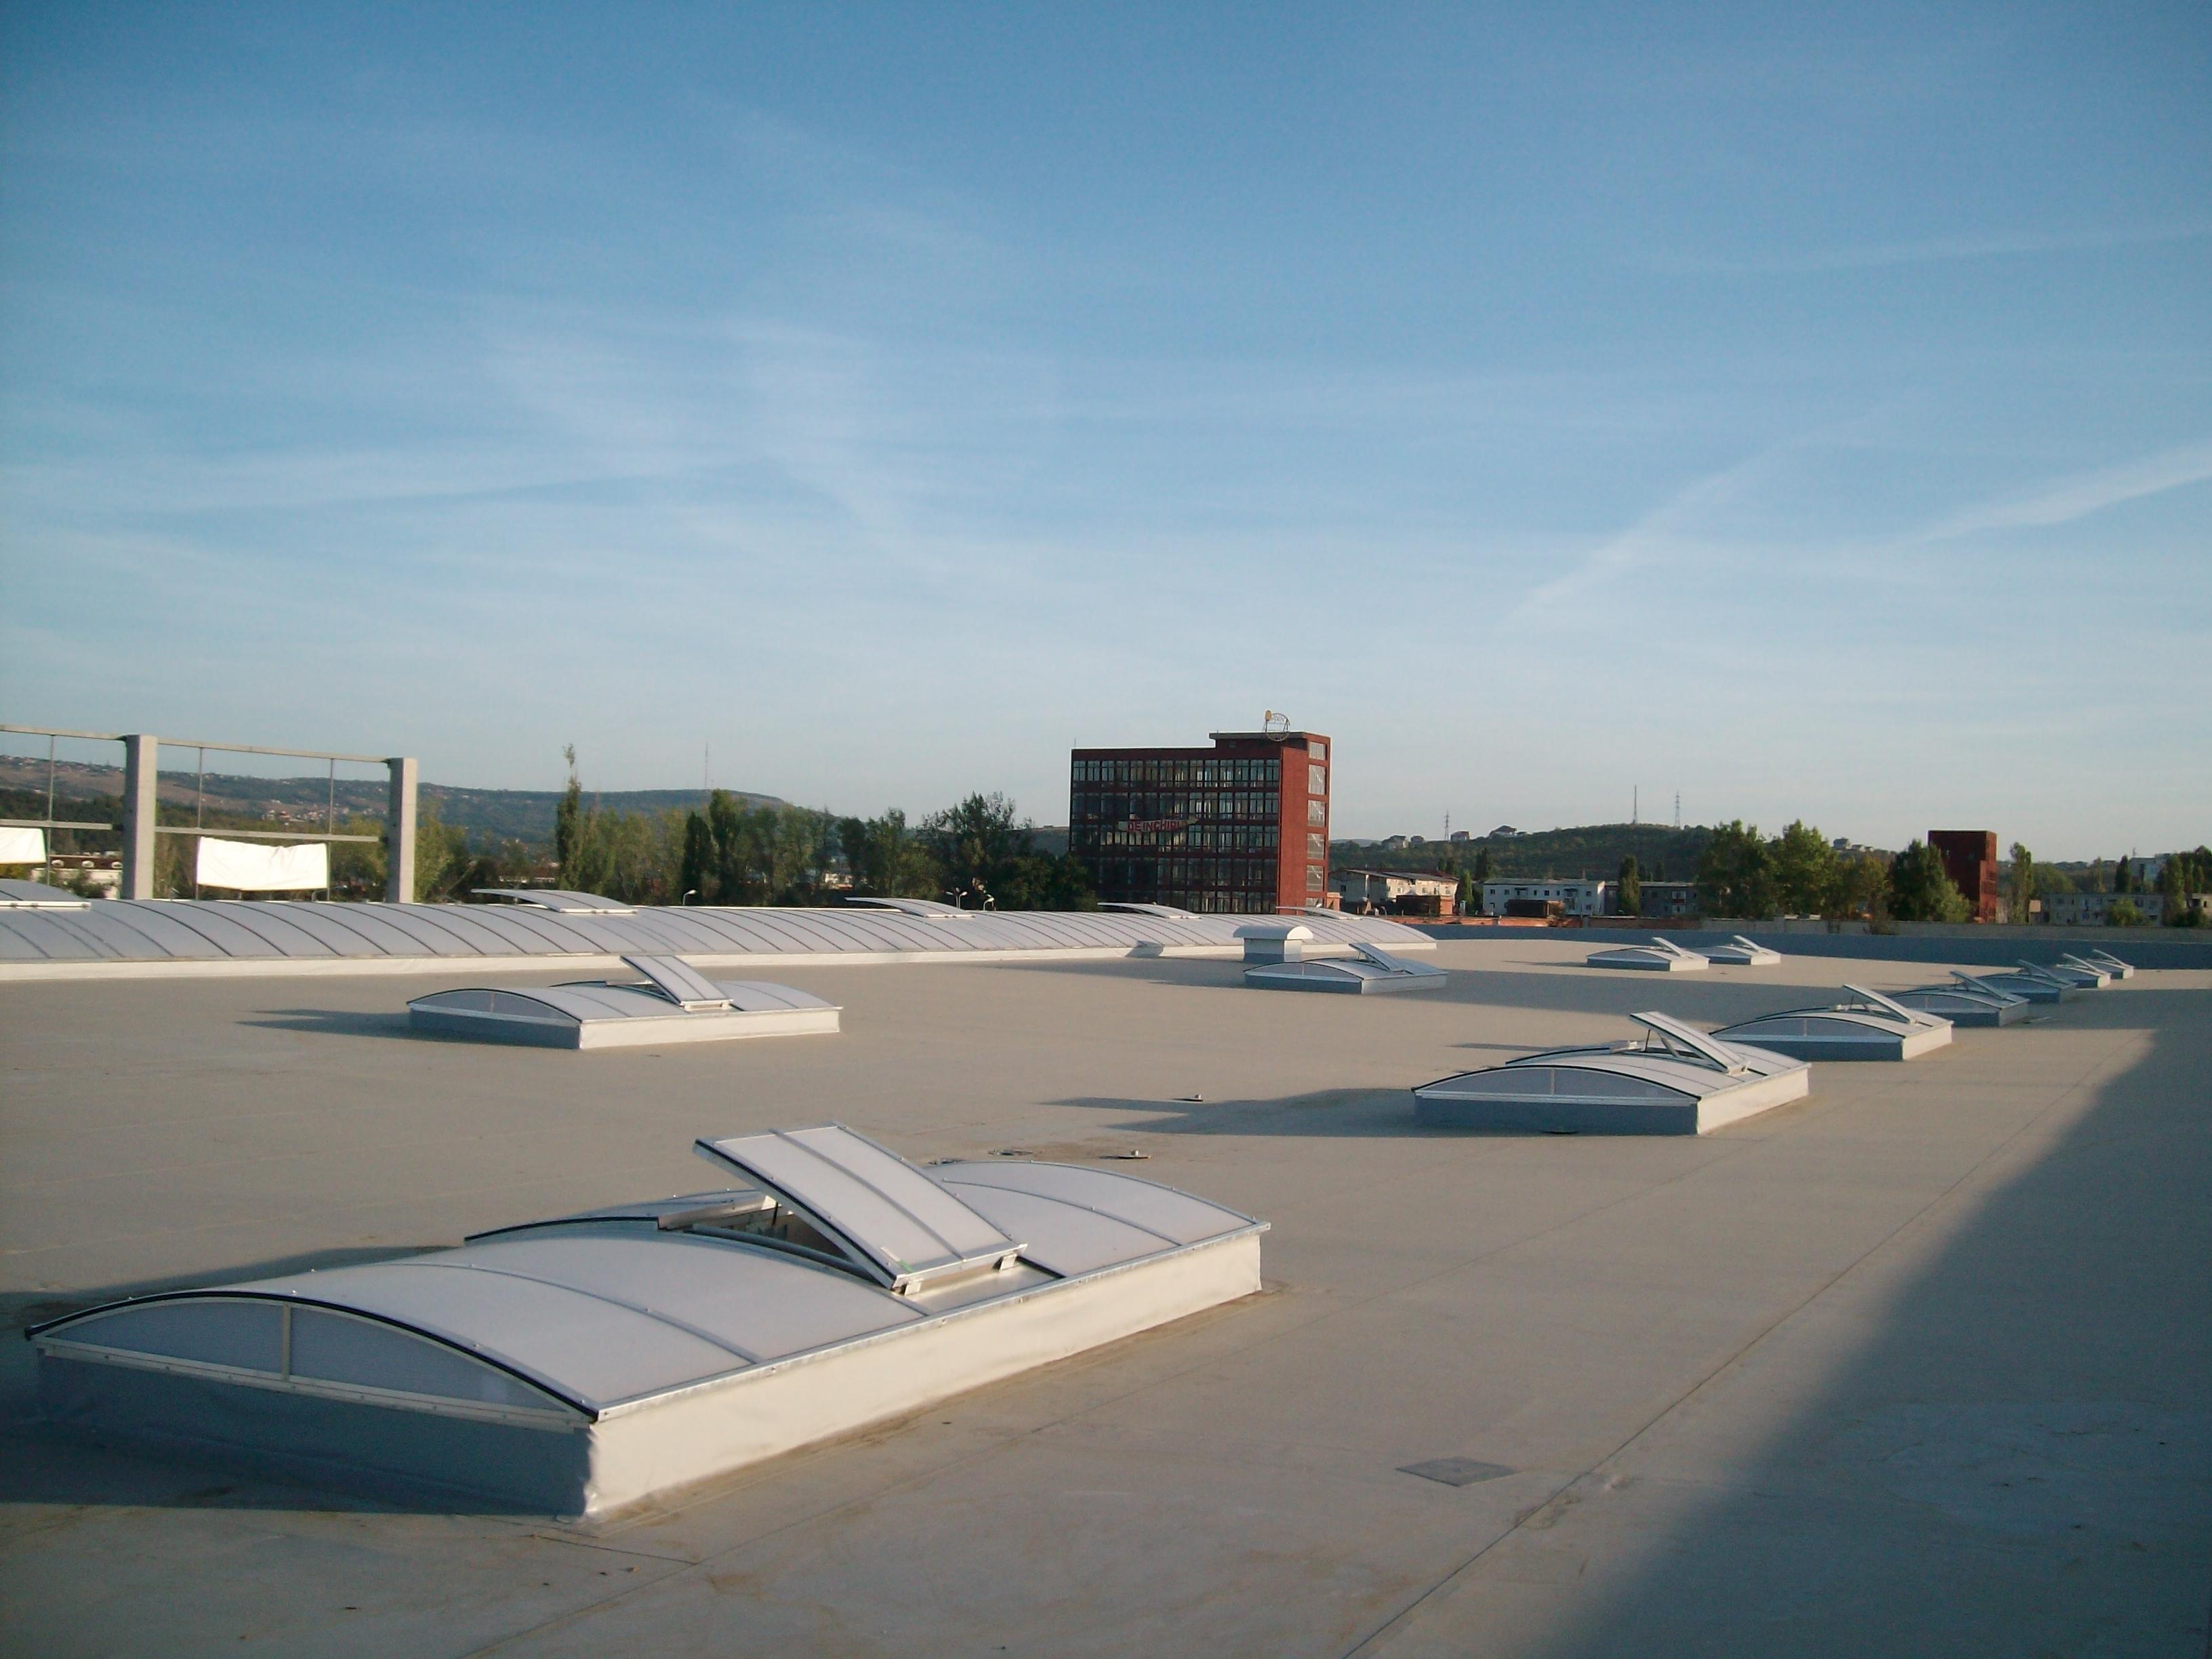 Luminatoare industriale - Spatiu comercial Baumax - Iasi HEXADOME - Poza 2